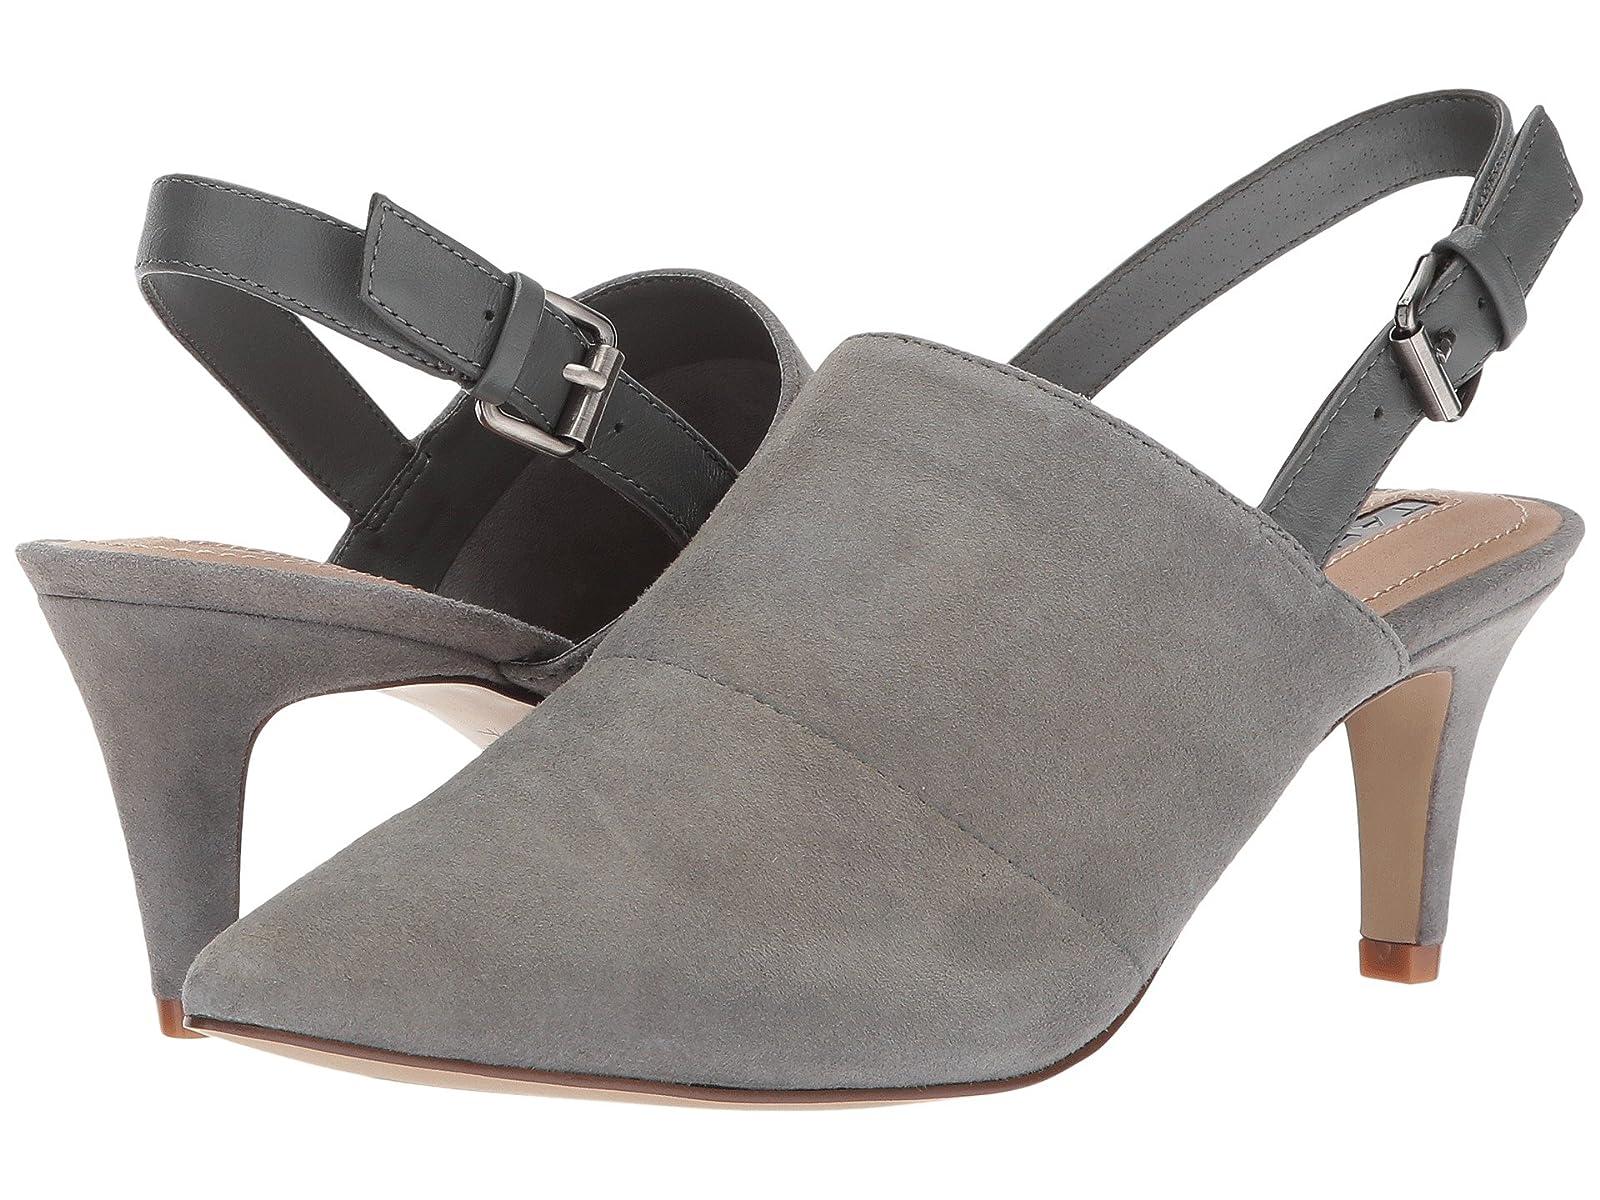 Tahari GayleCheap and distinctive eye-catching shoes